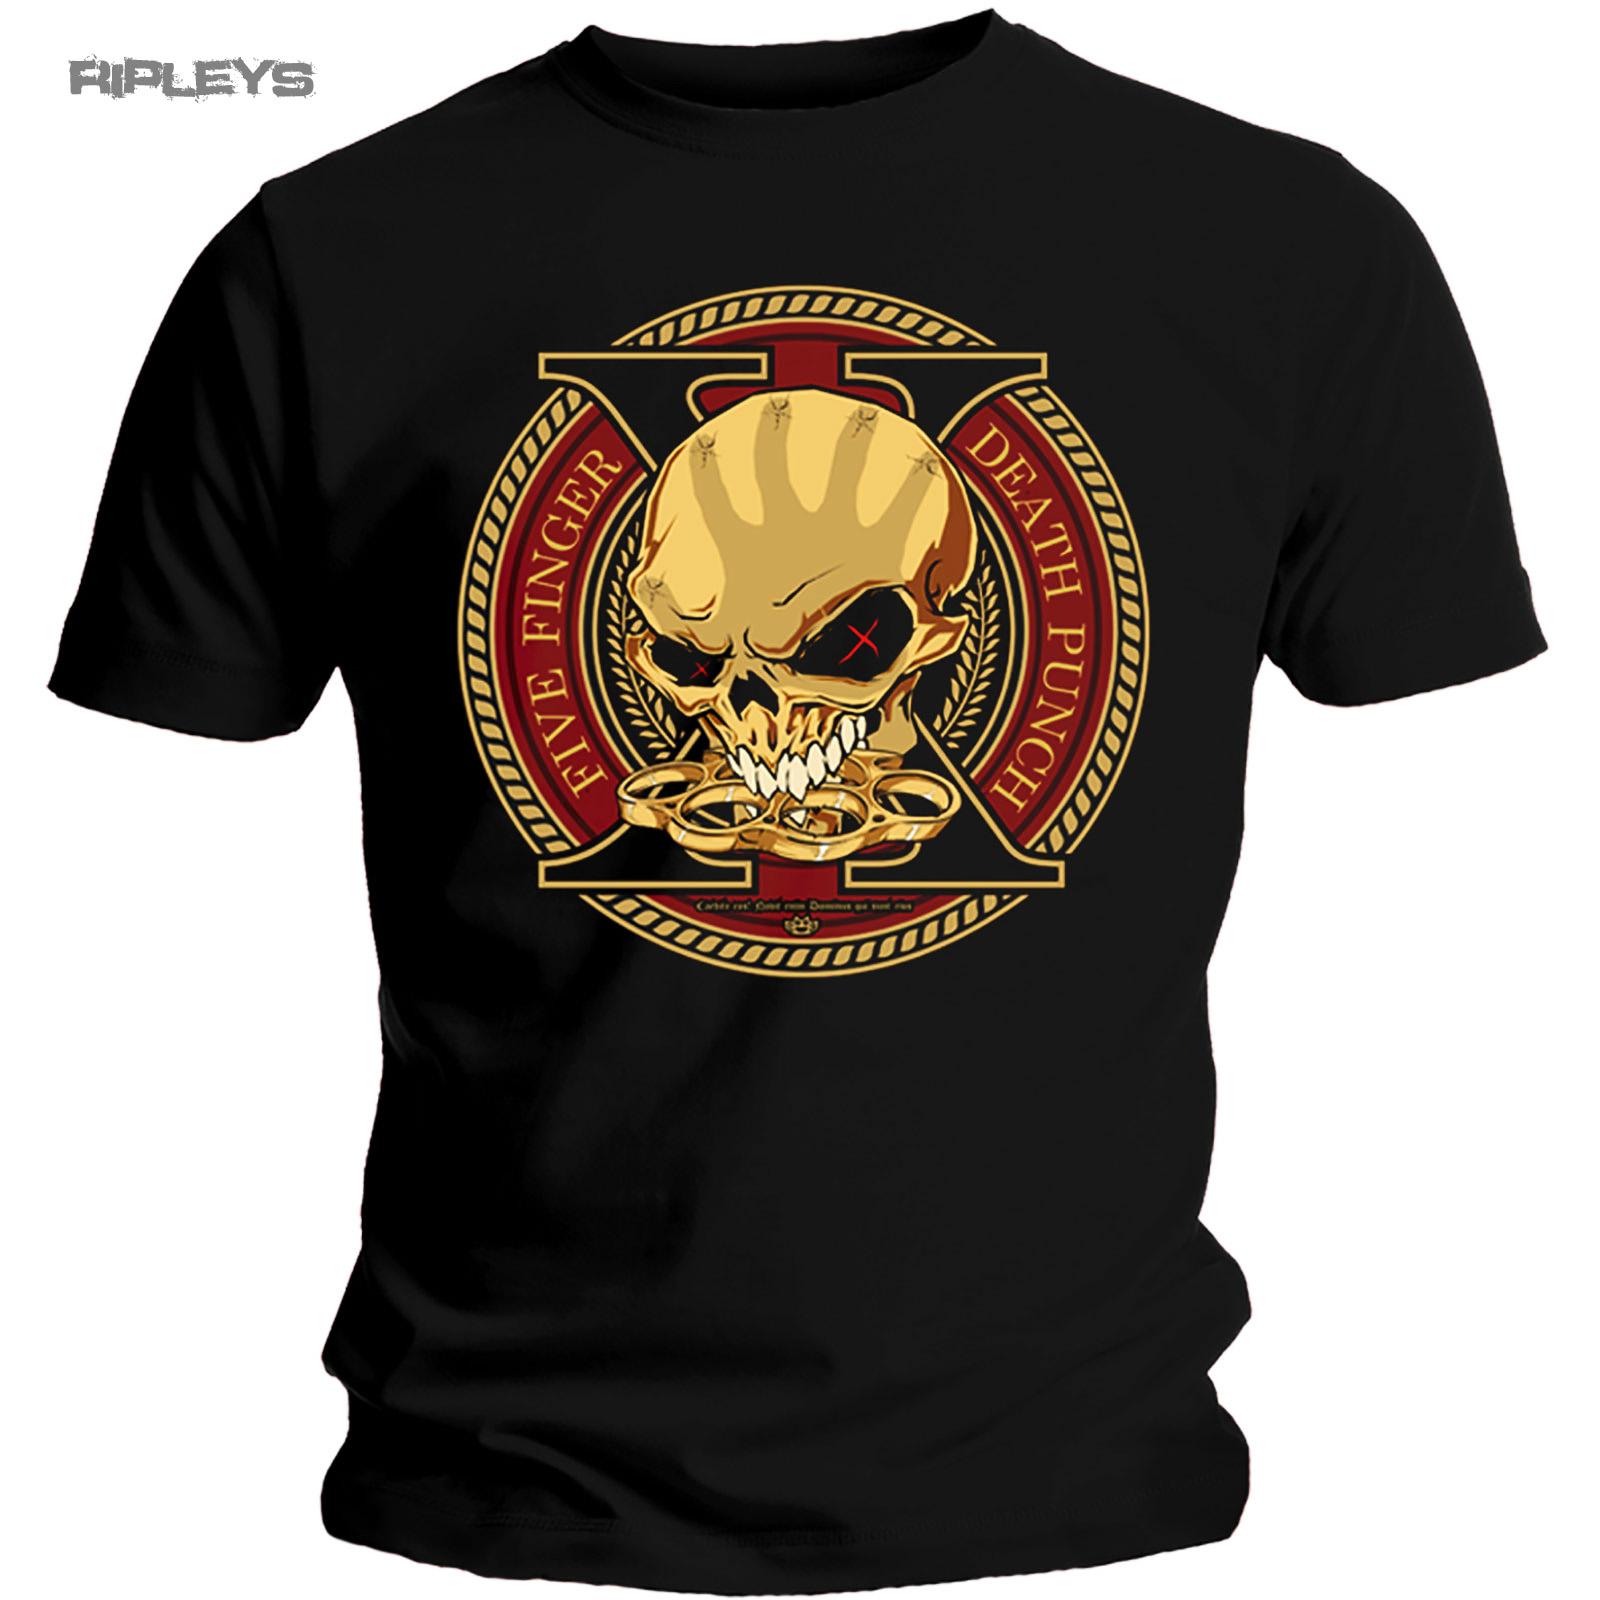 Official-T-Shirt-Five-Finger-Death-Punch-Album-DECADE-of-Destruction-All-Sizes thumbnail 10